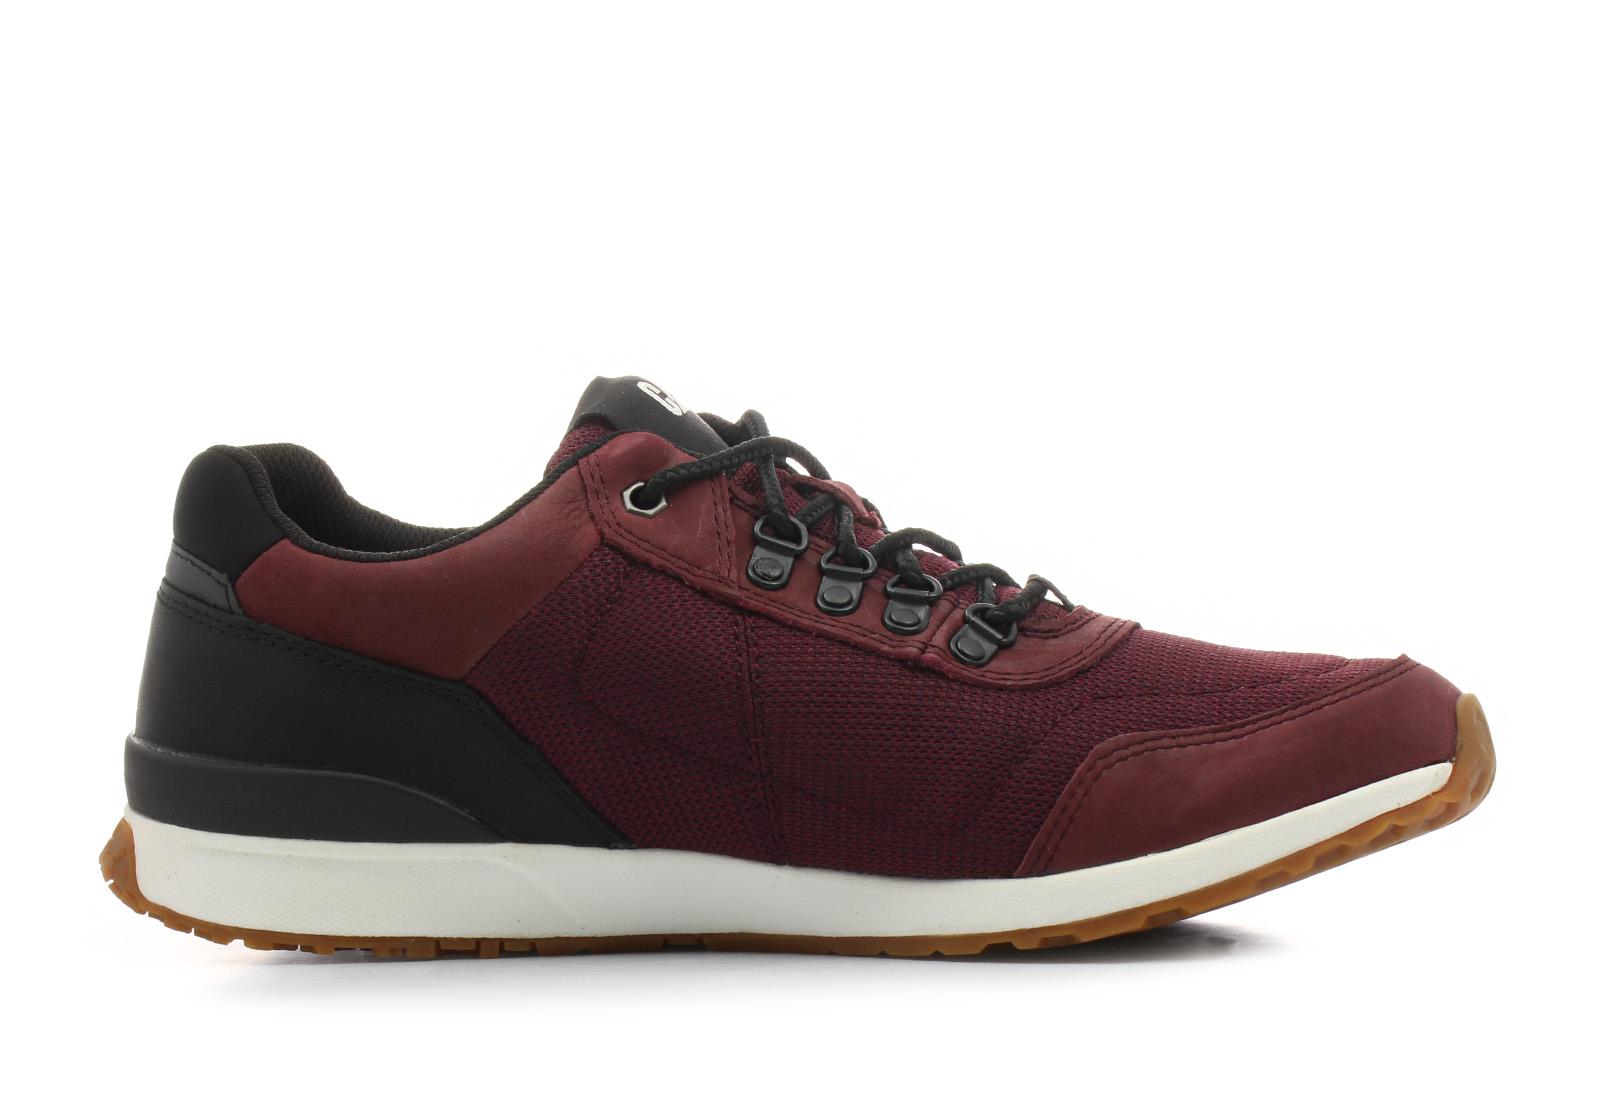 CAT Footwear Lapaz Sneaker qMXB3Oqag9